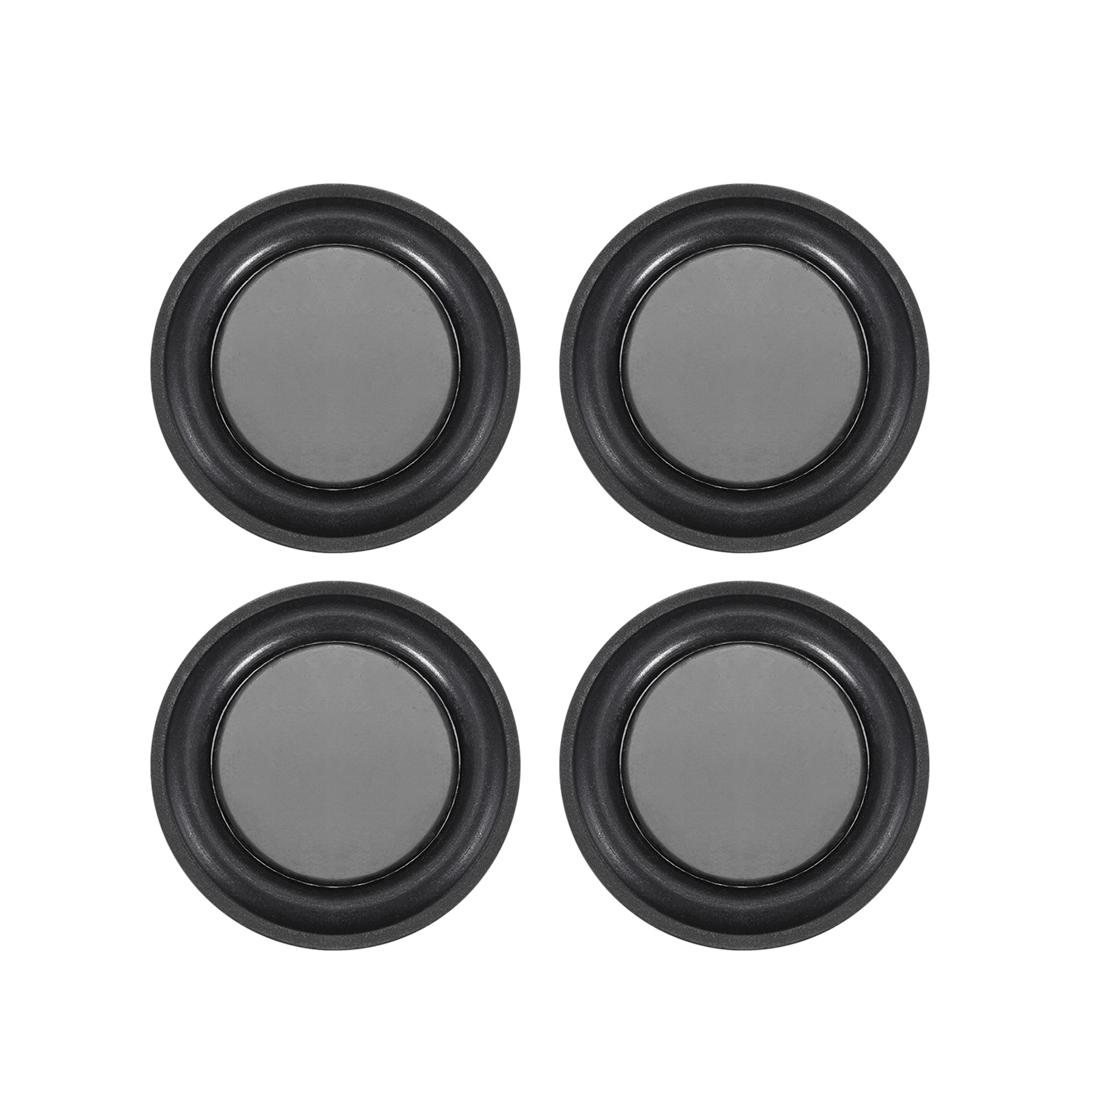 "4Pcs 1.8"" 45mm Bass Speaker Passive Radiator Rubber Vibration Plate DIY Repair"